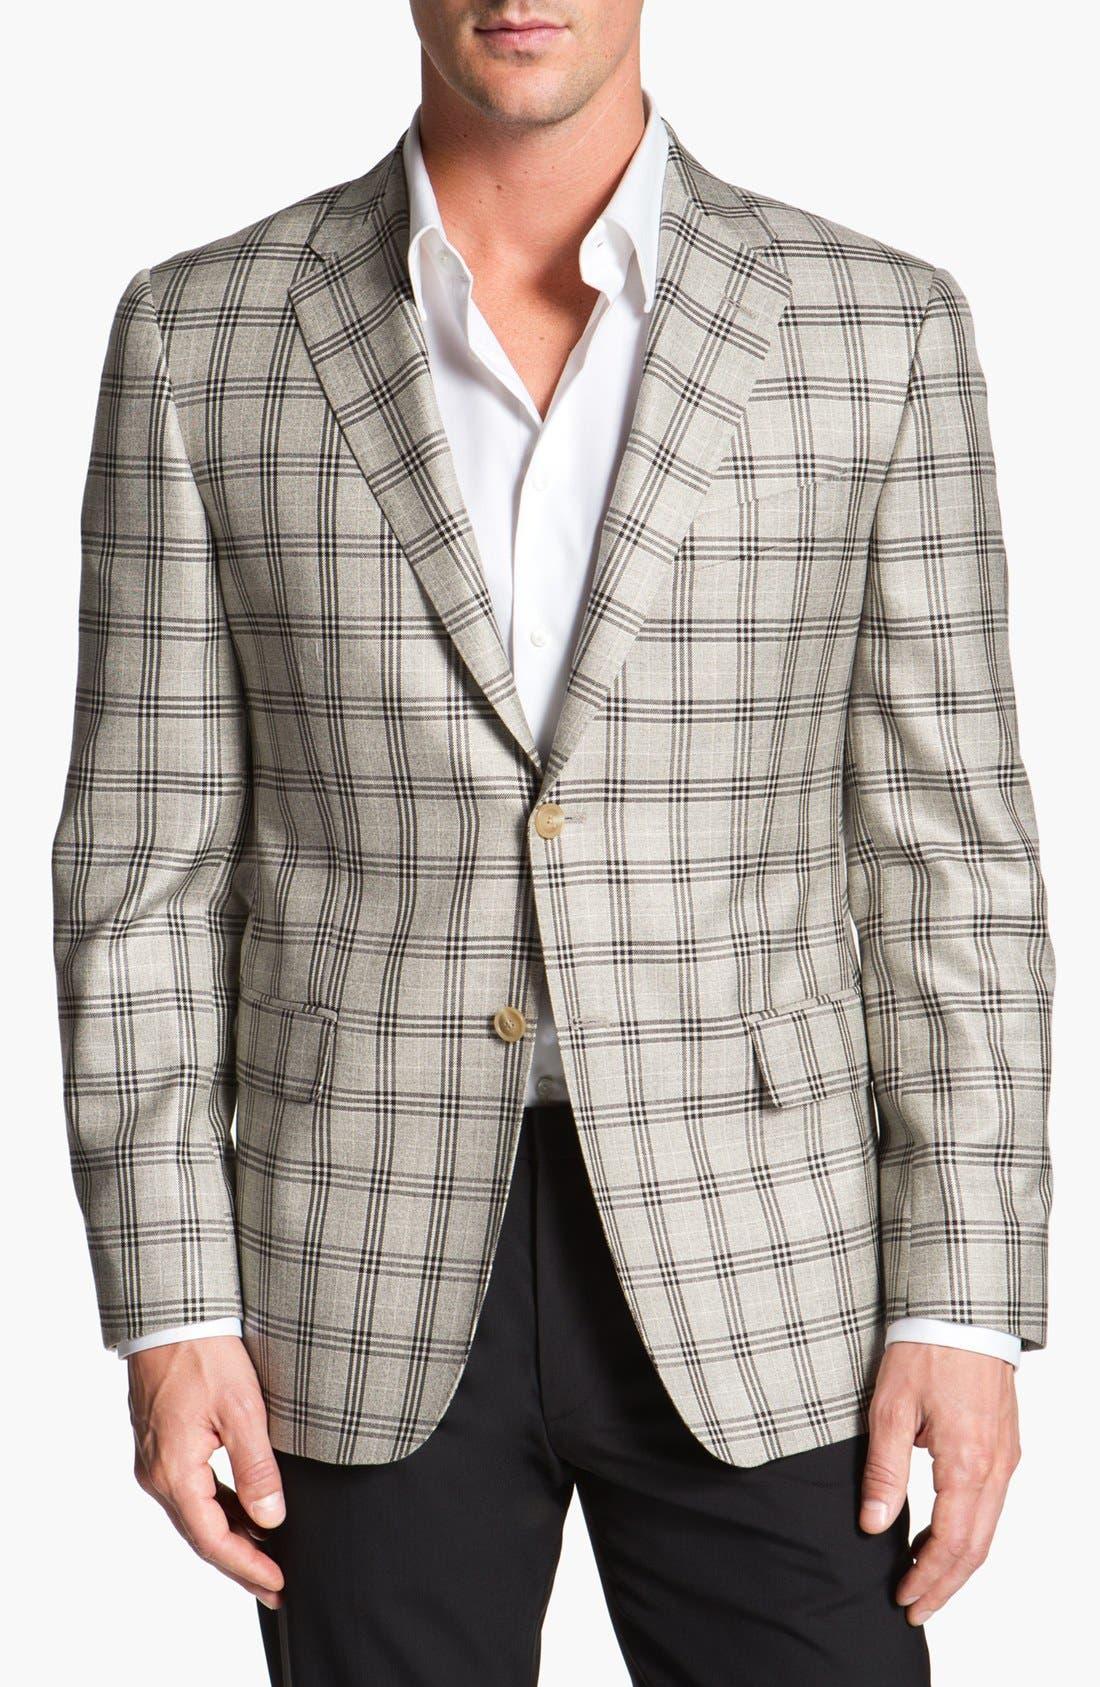 Main Image - Joseph Abboud 'Platinum' Plaid Wool Sportcoat